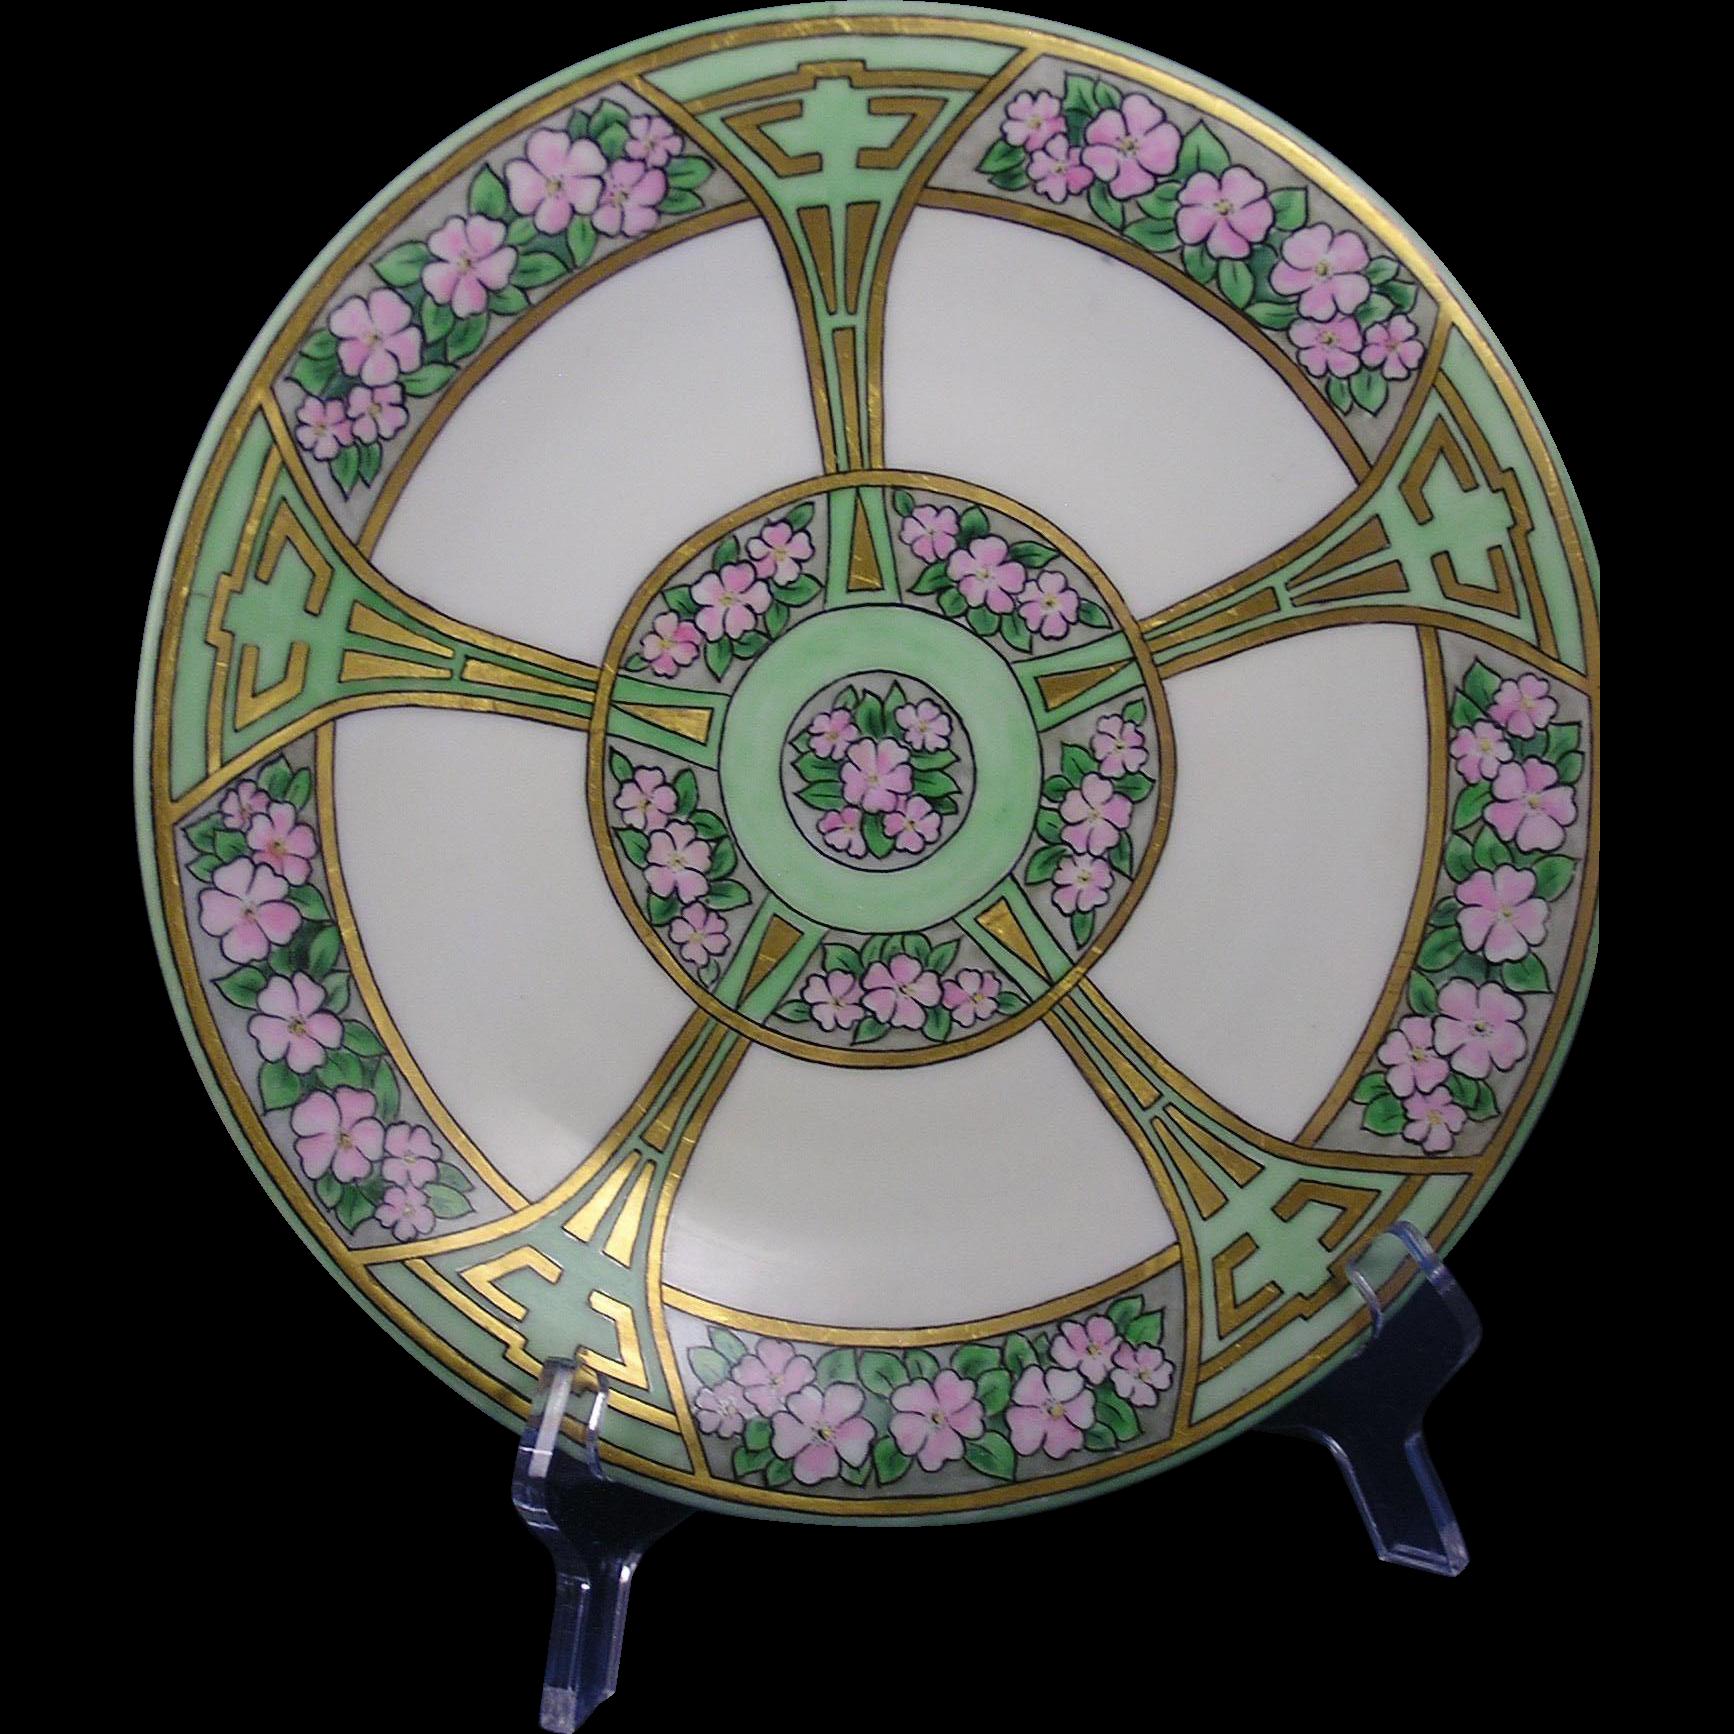 Bernardaud & Co. (B&Co.) Limoges Pink Floral & Art Deco Gold Motif Plate (c.1900-1914)